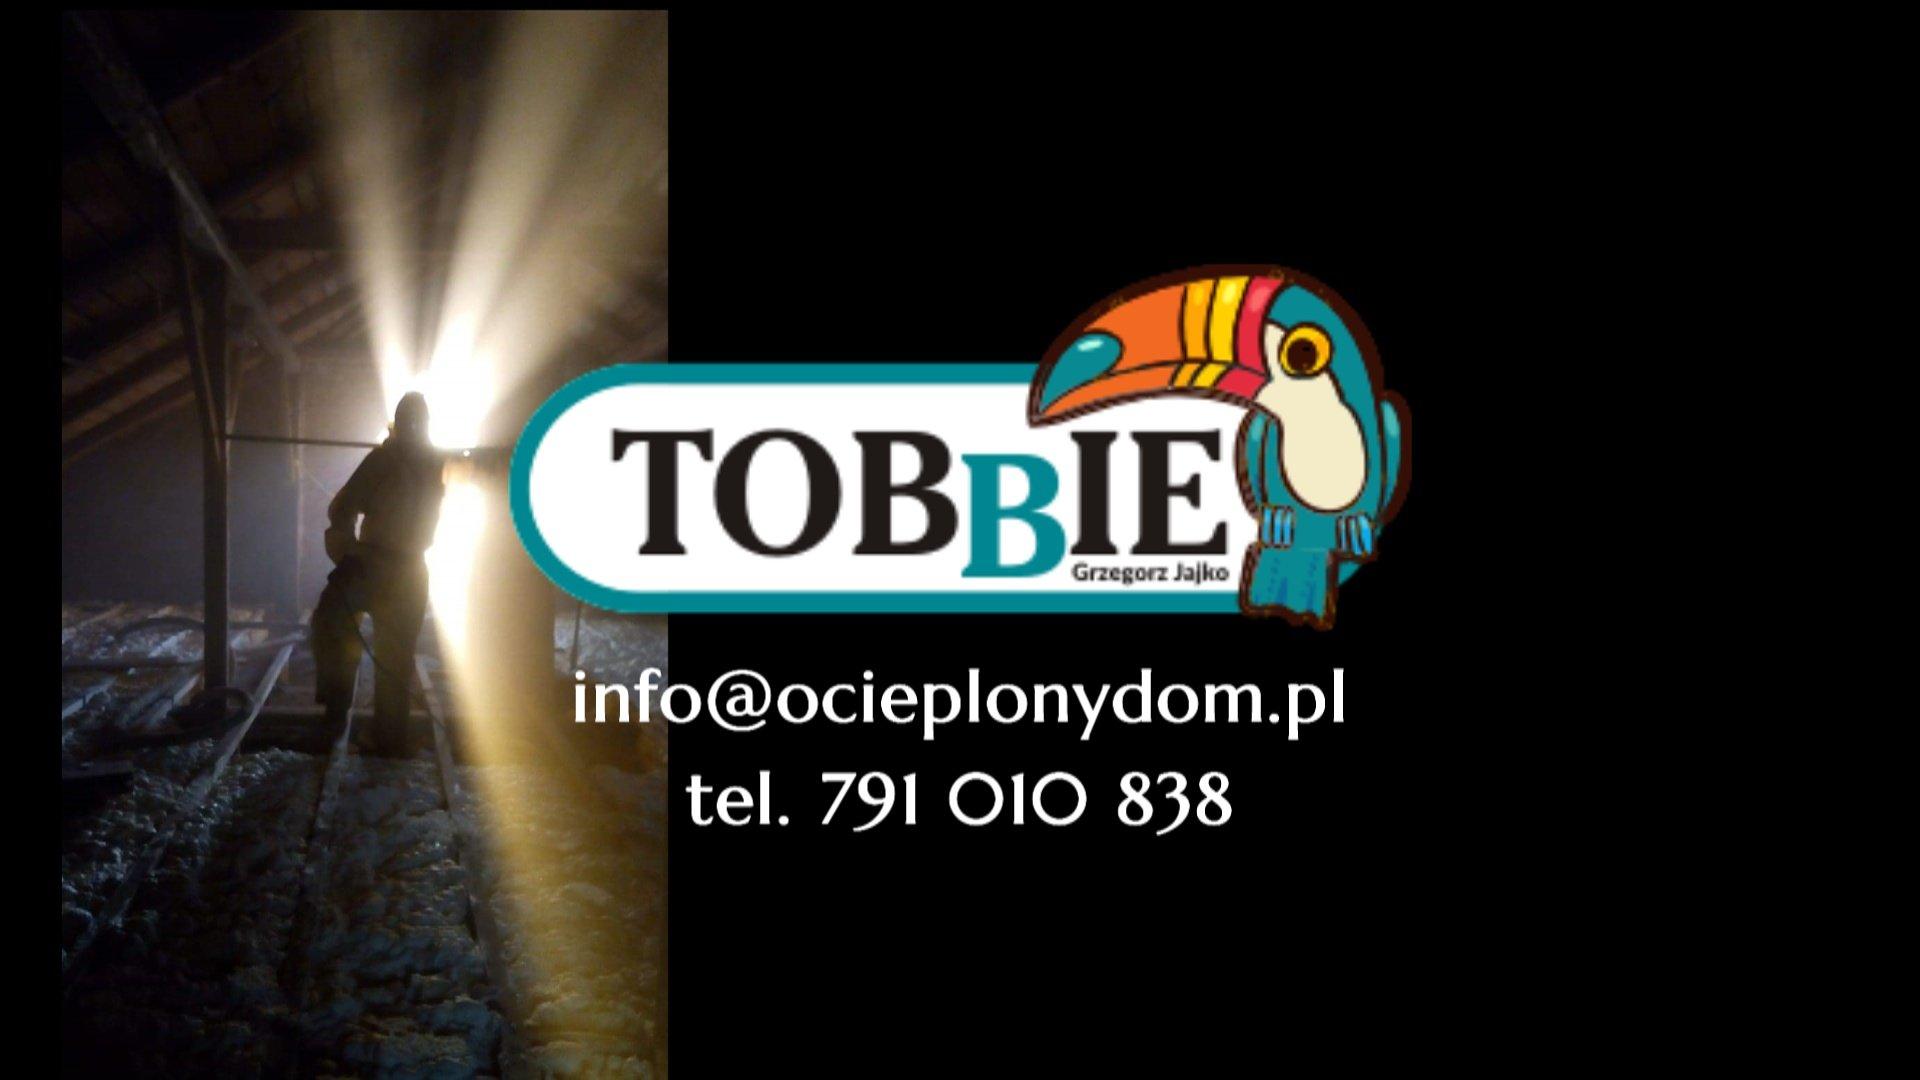 https://ocieplonydom.pl/wp-content/uploads/2019/01/Tobbie-Ocieplony-dom-Firma.jpg